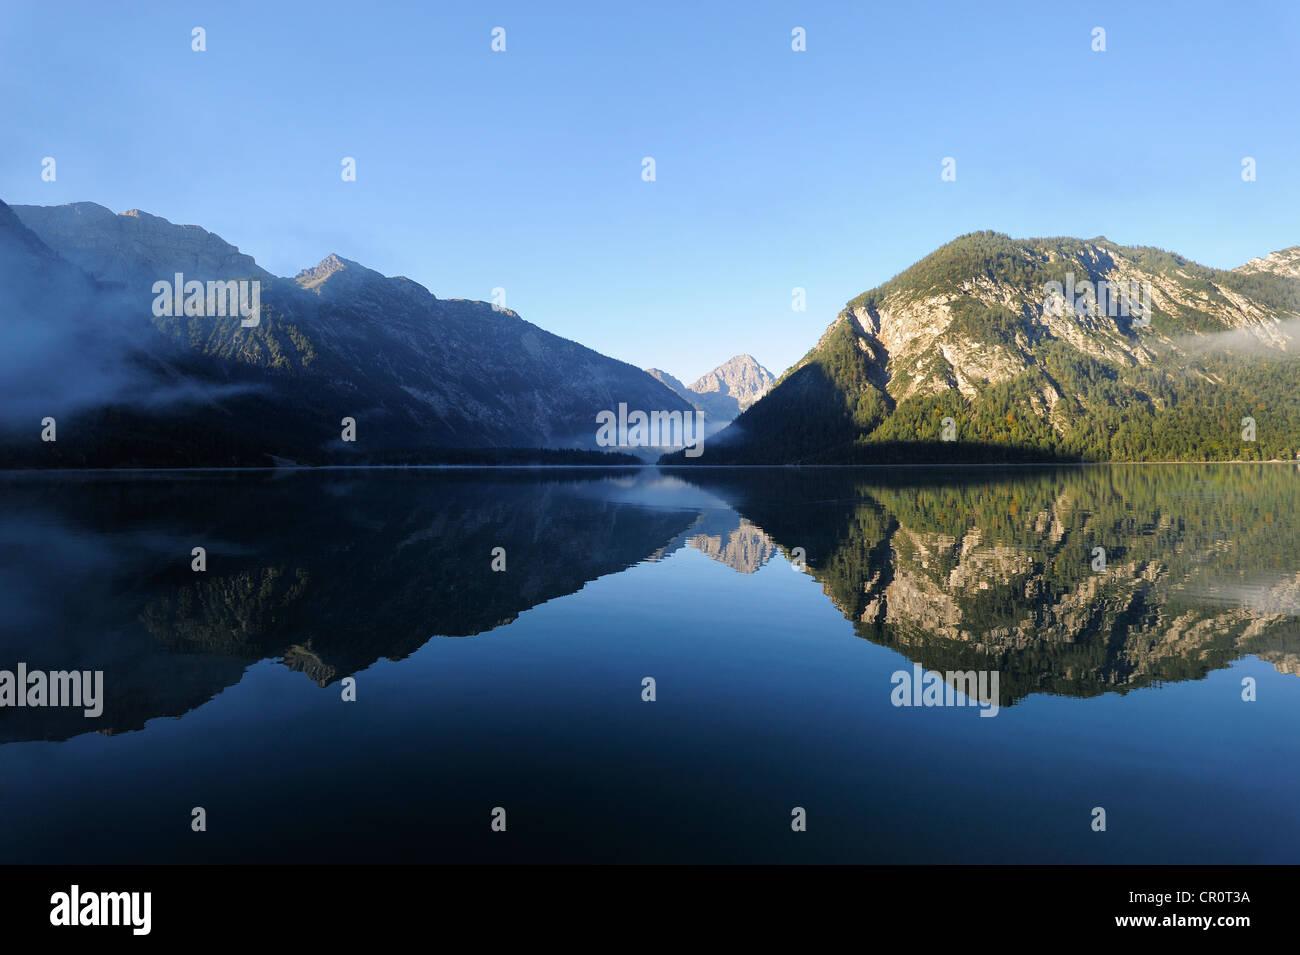 Lago Plansee, Alpi Ammergau, Ammergebirge montagne, guardando verso Thaneller montagna delle Alpi Lechtal, Tirolo, Immagini Stock